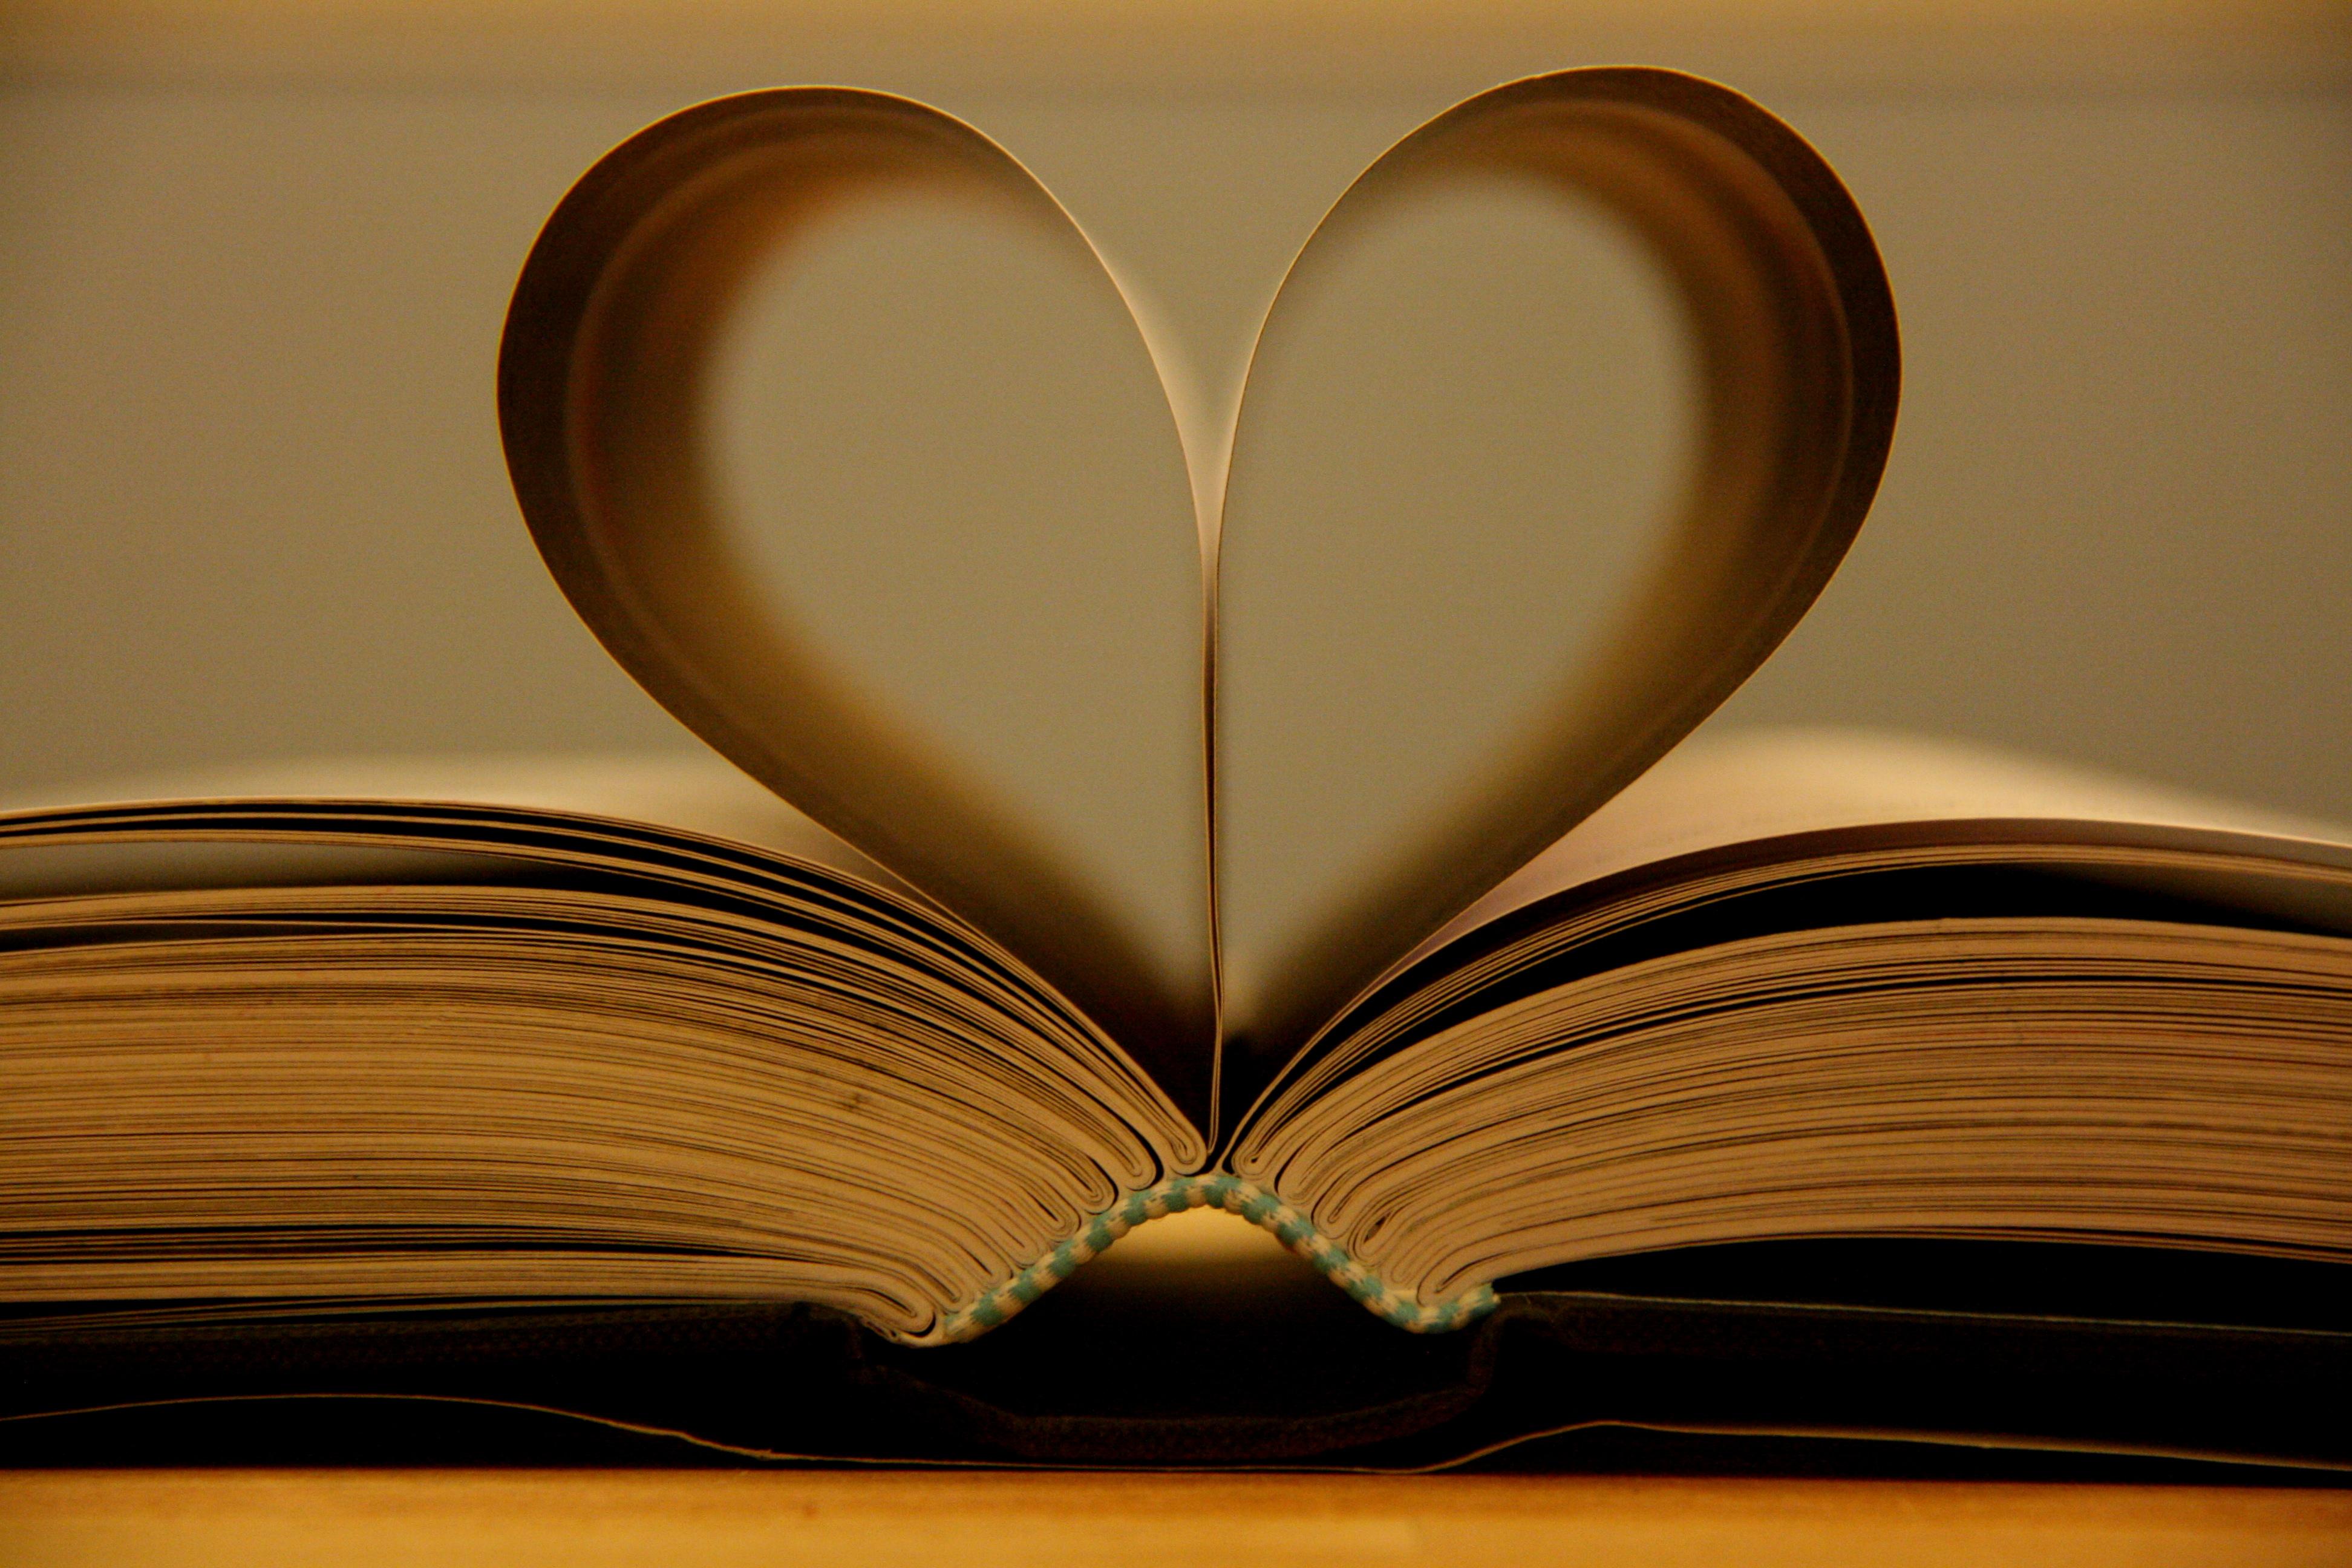 Wallpaper Love Heart Wood Book Still Life